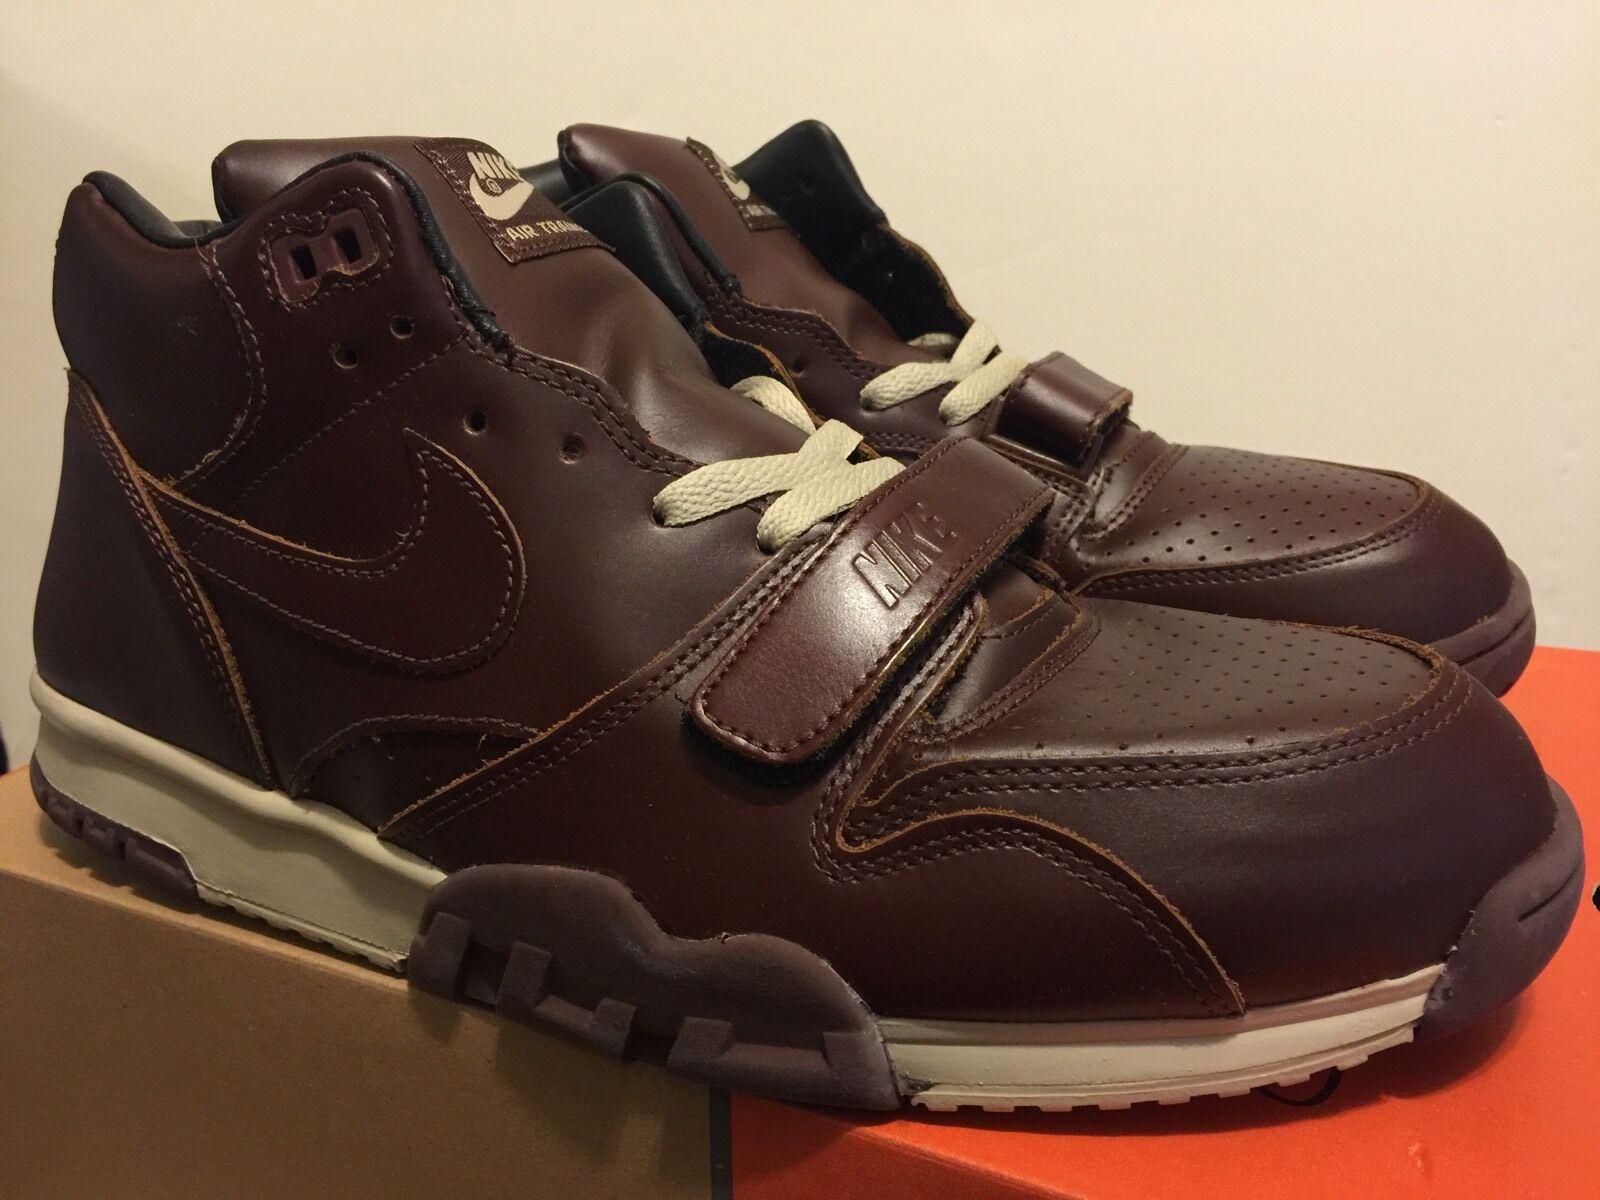 Nike air trainer 1. prämie 2003 brunnet brunnet brunnet / brunnet größe 13 neue ds bekannten leder 01b9eb